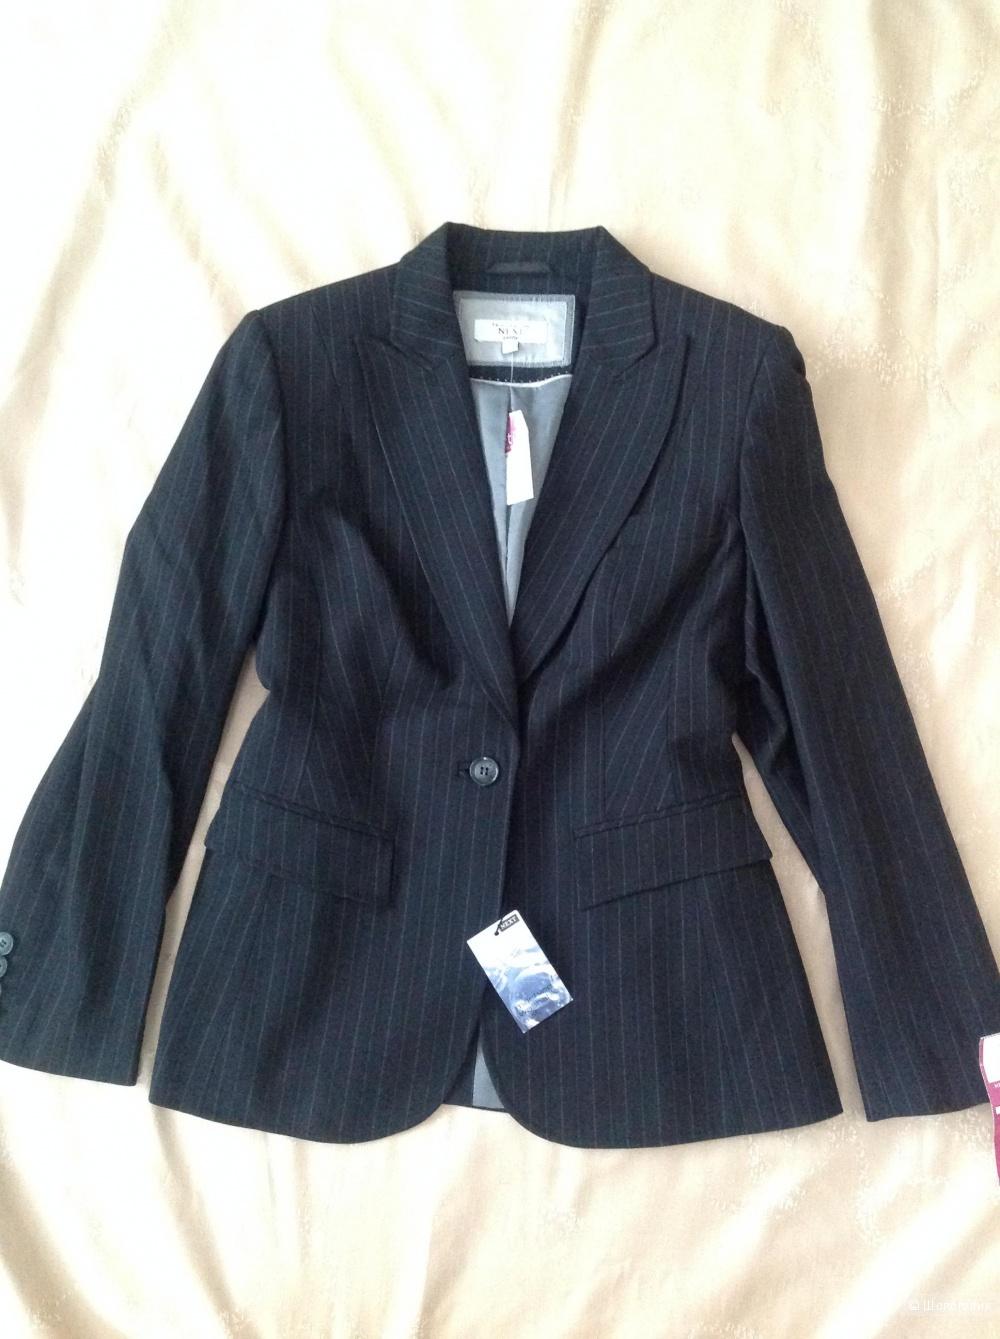 Пиджак жакет NEXT, UK 14, на 48-50